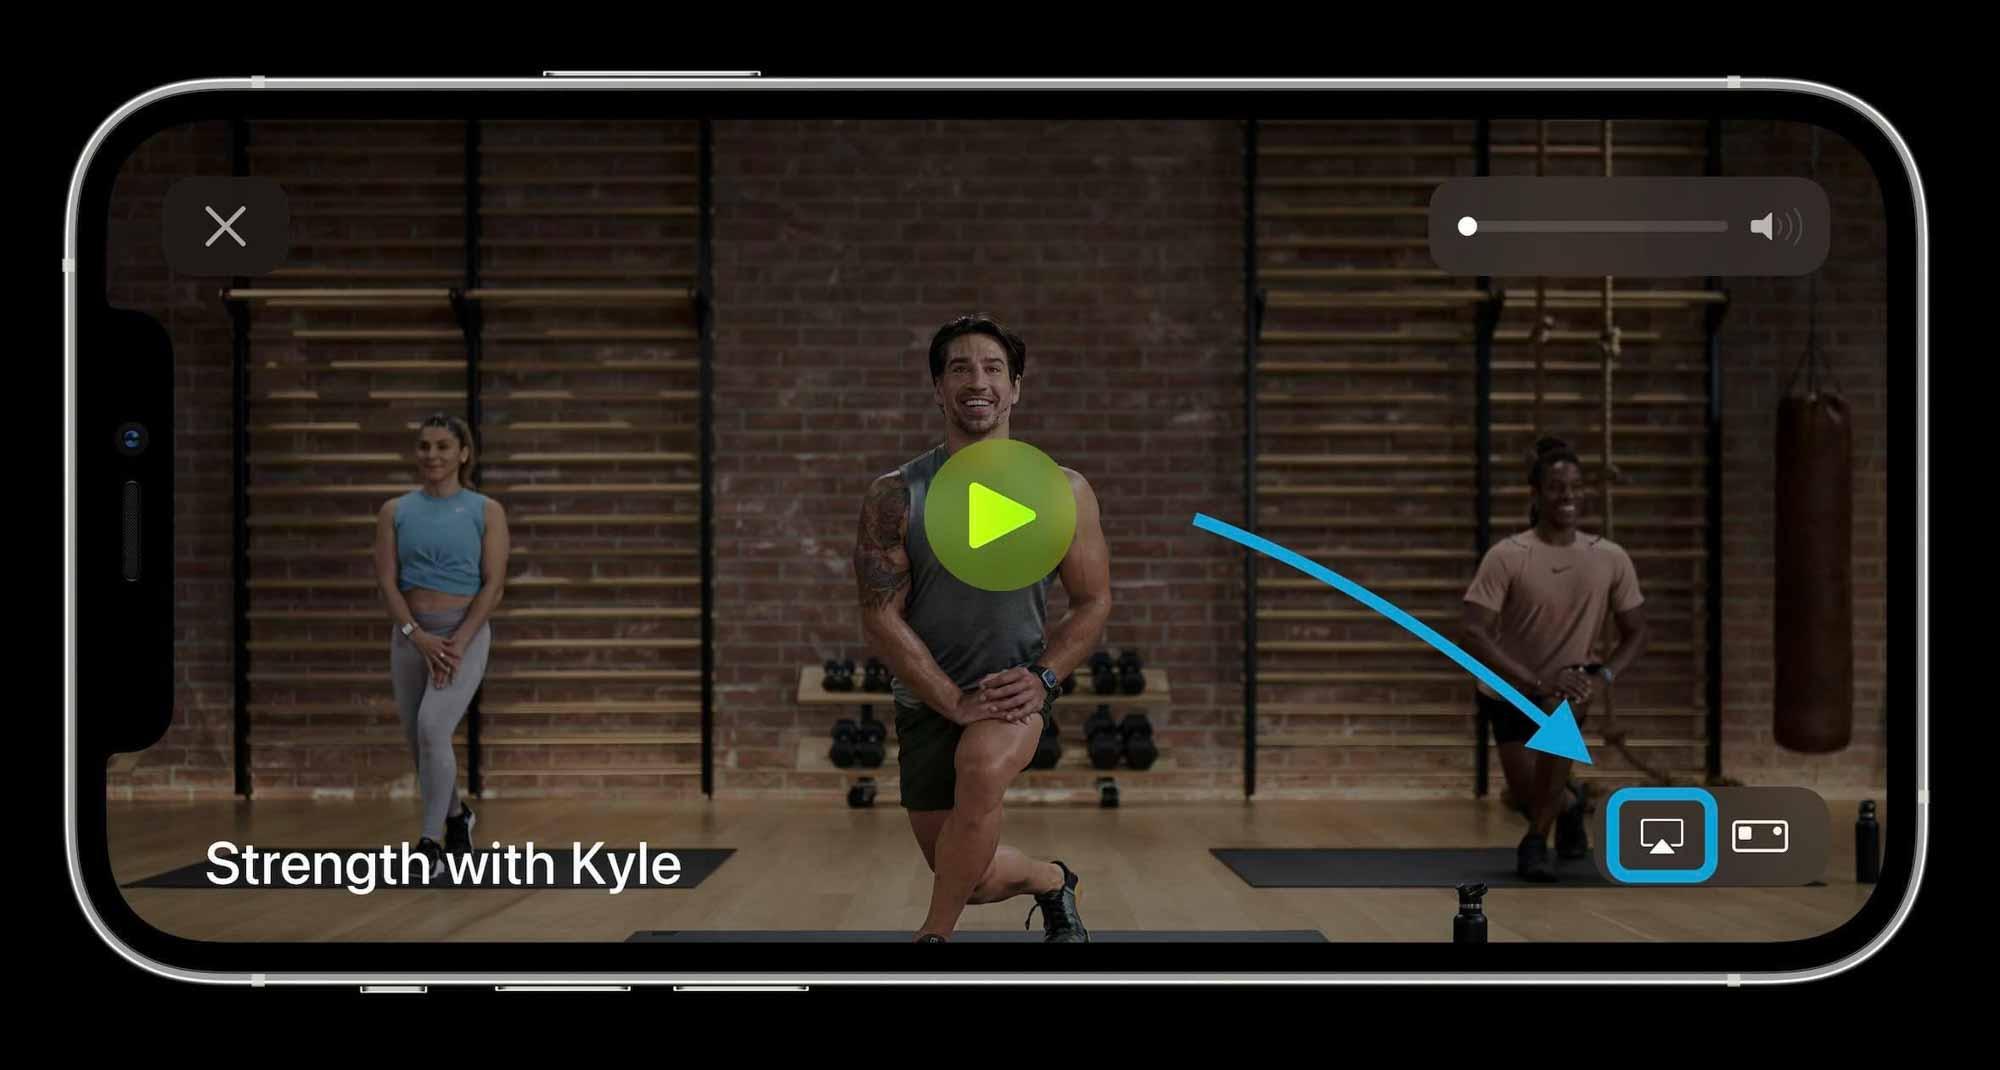 Как AirPlay Apple Fitness+ классы к телевизору - пошаговое руководство 1